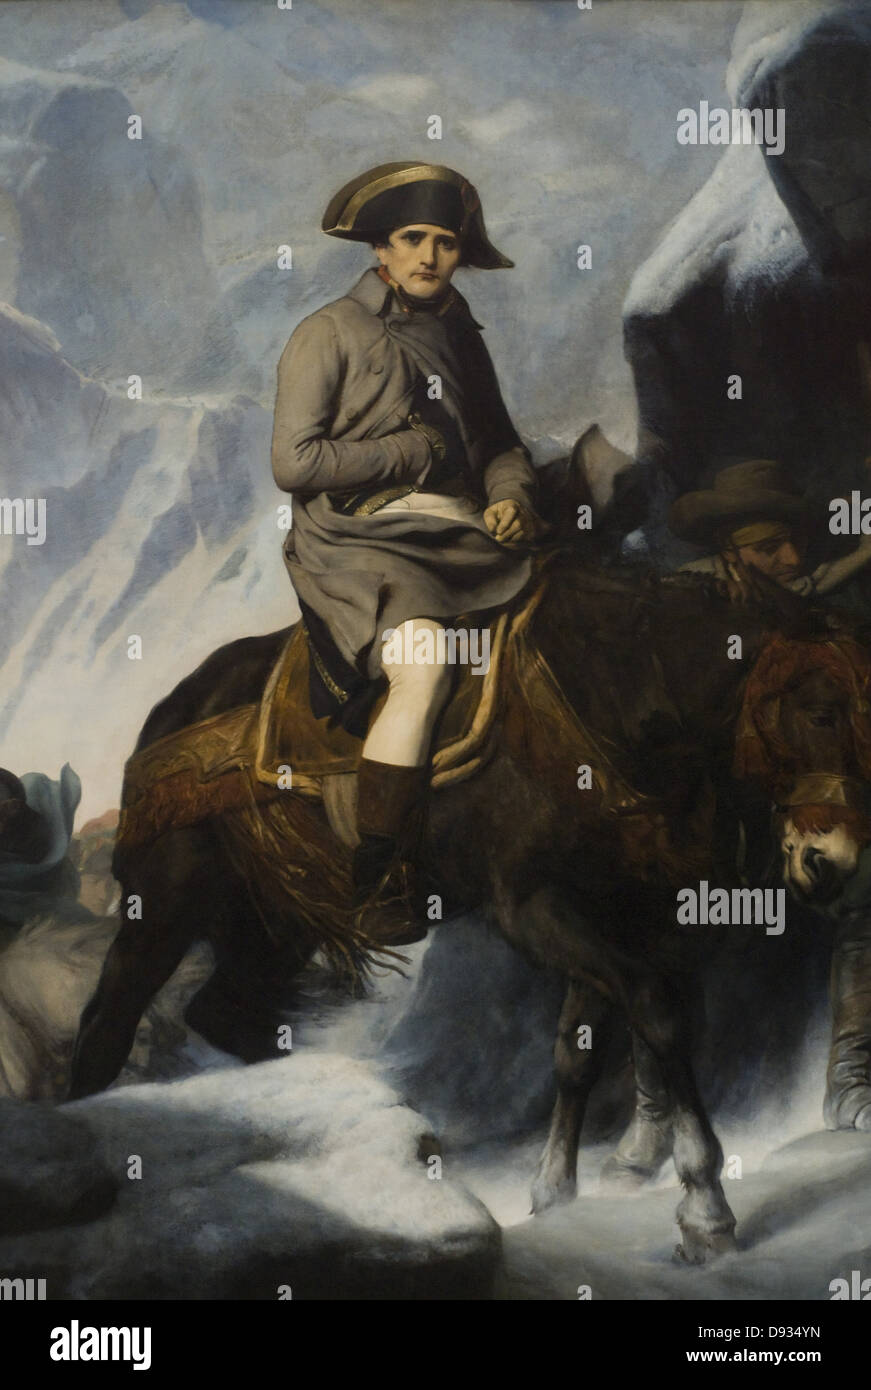 Paul Delaroche Bonaparte franchissant les Alpes en 1800 - Bonaparte crossing the Alps in 1800 retail 1848 XIX th - Stock Image